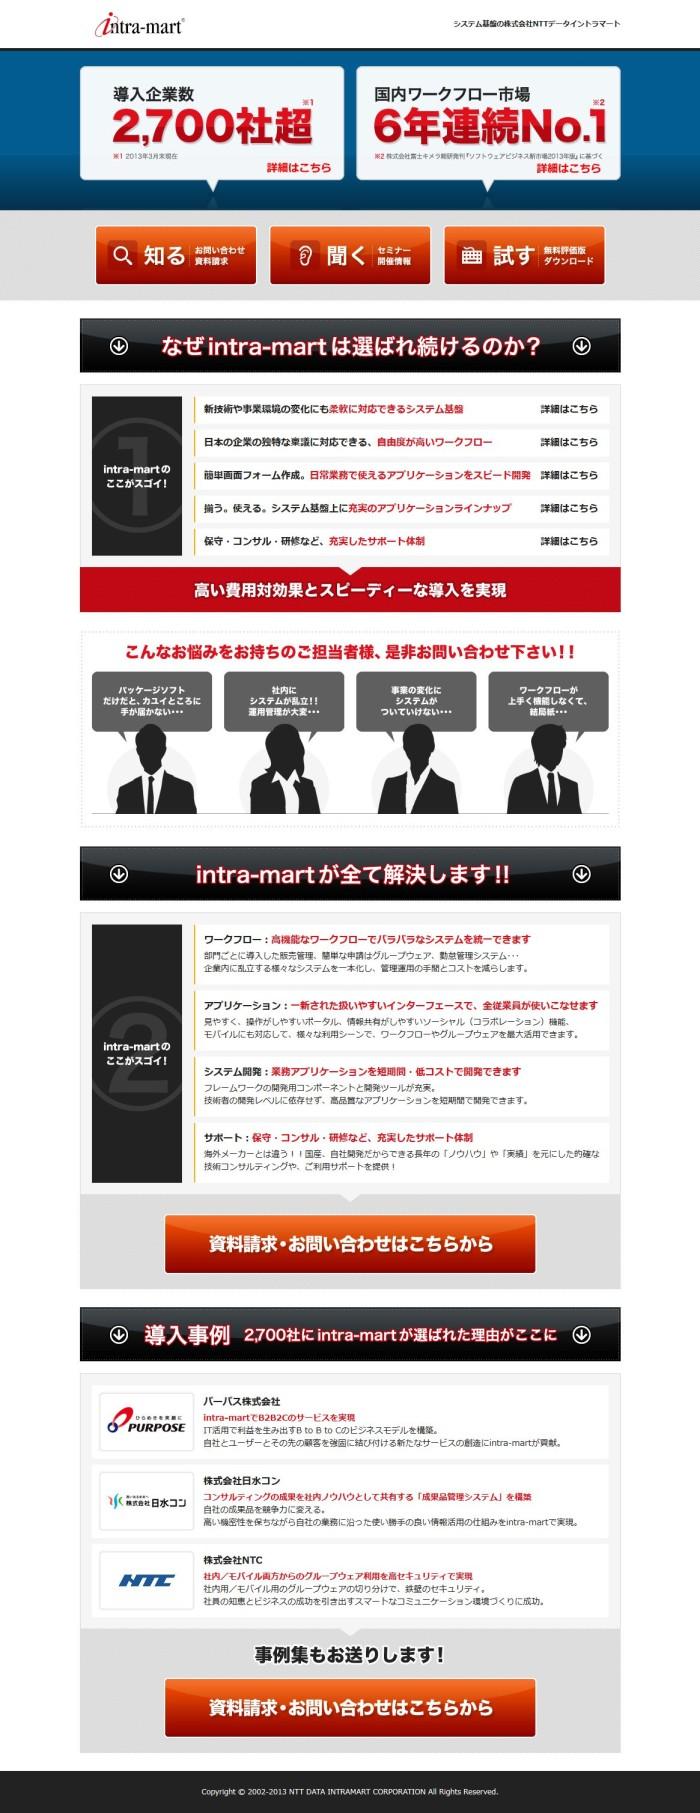 NTTデータイントラマート